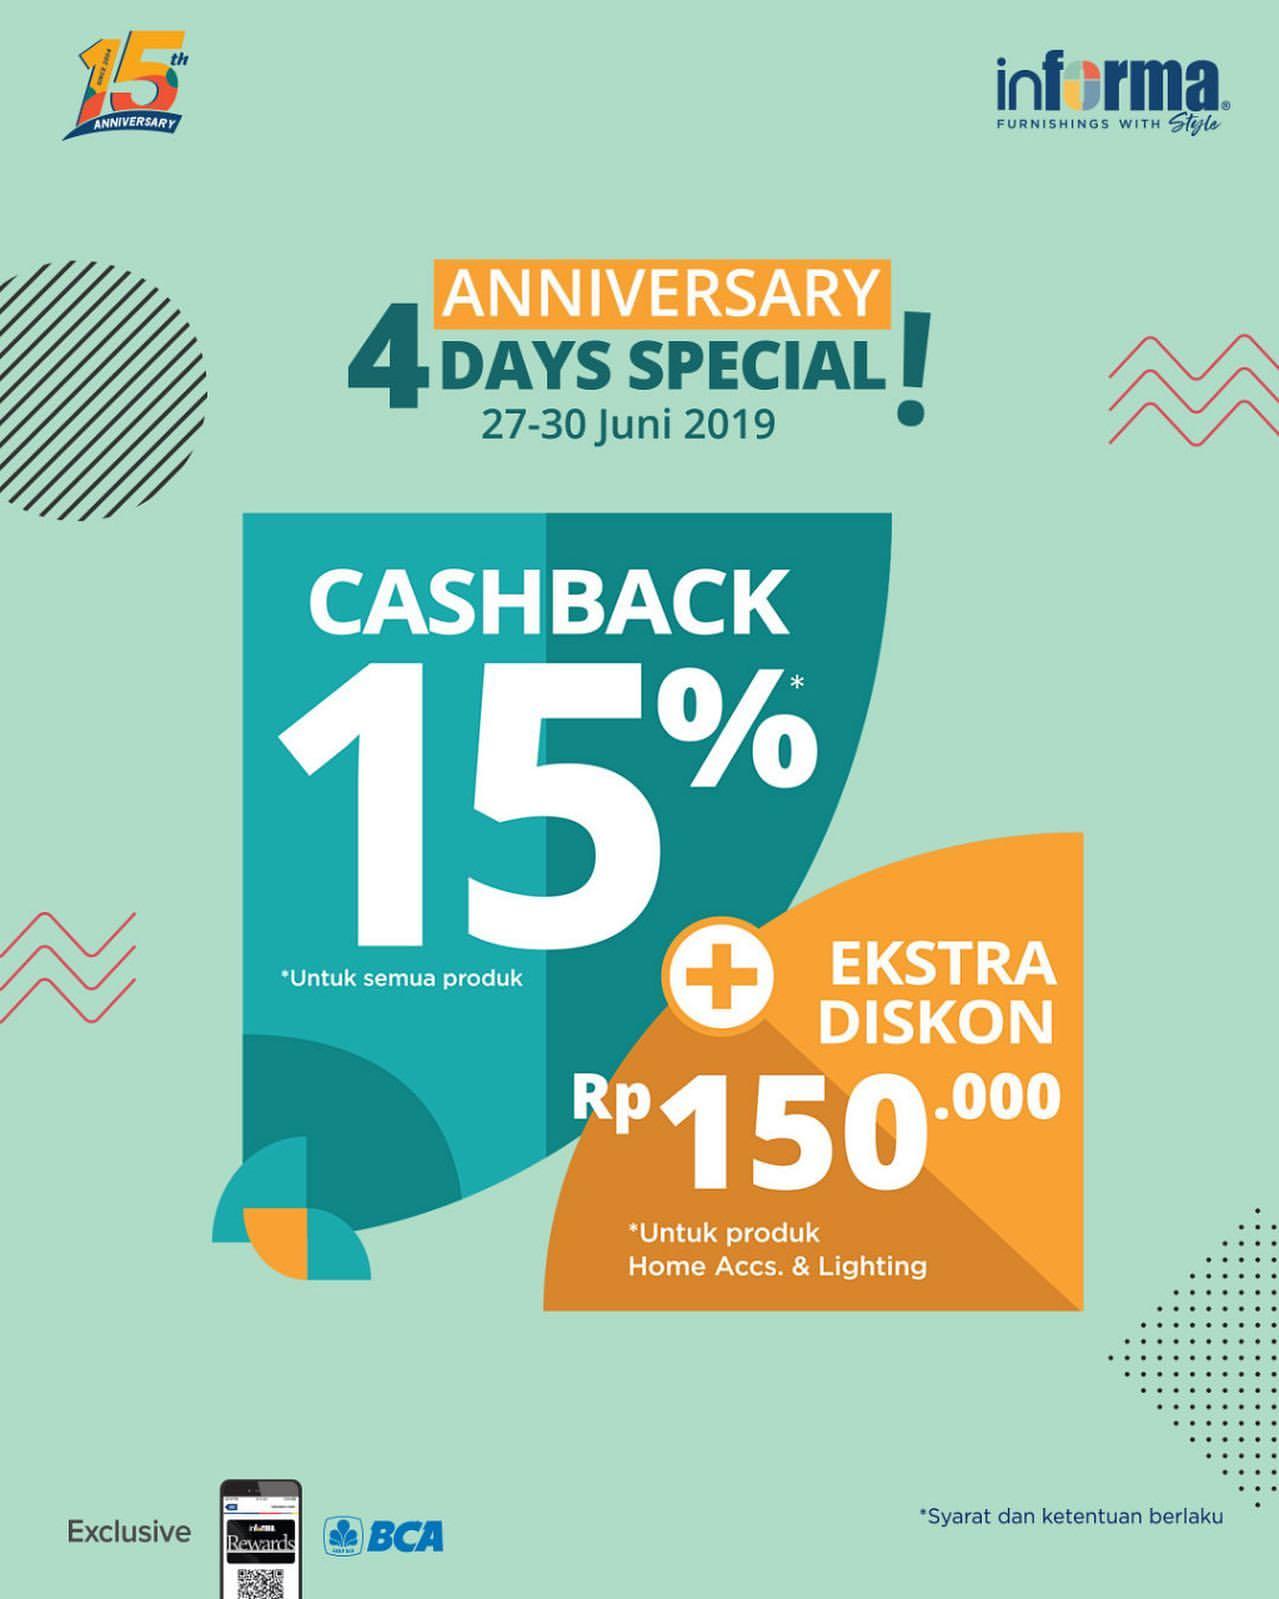 INFORMA Promo Special Anniversary Hanya 4 Hari! CASHBACK 15%